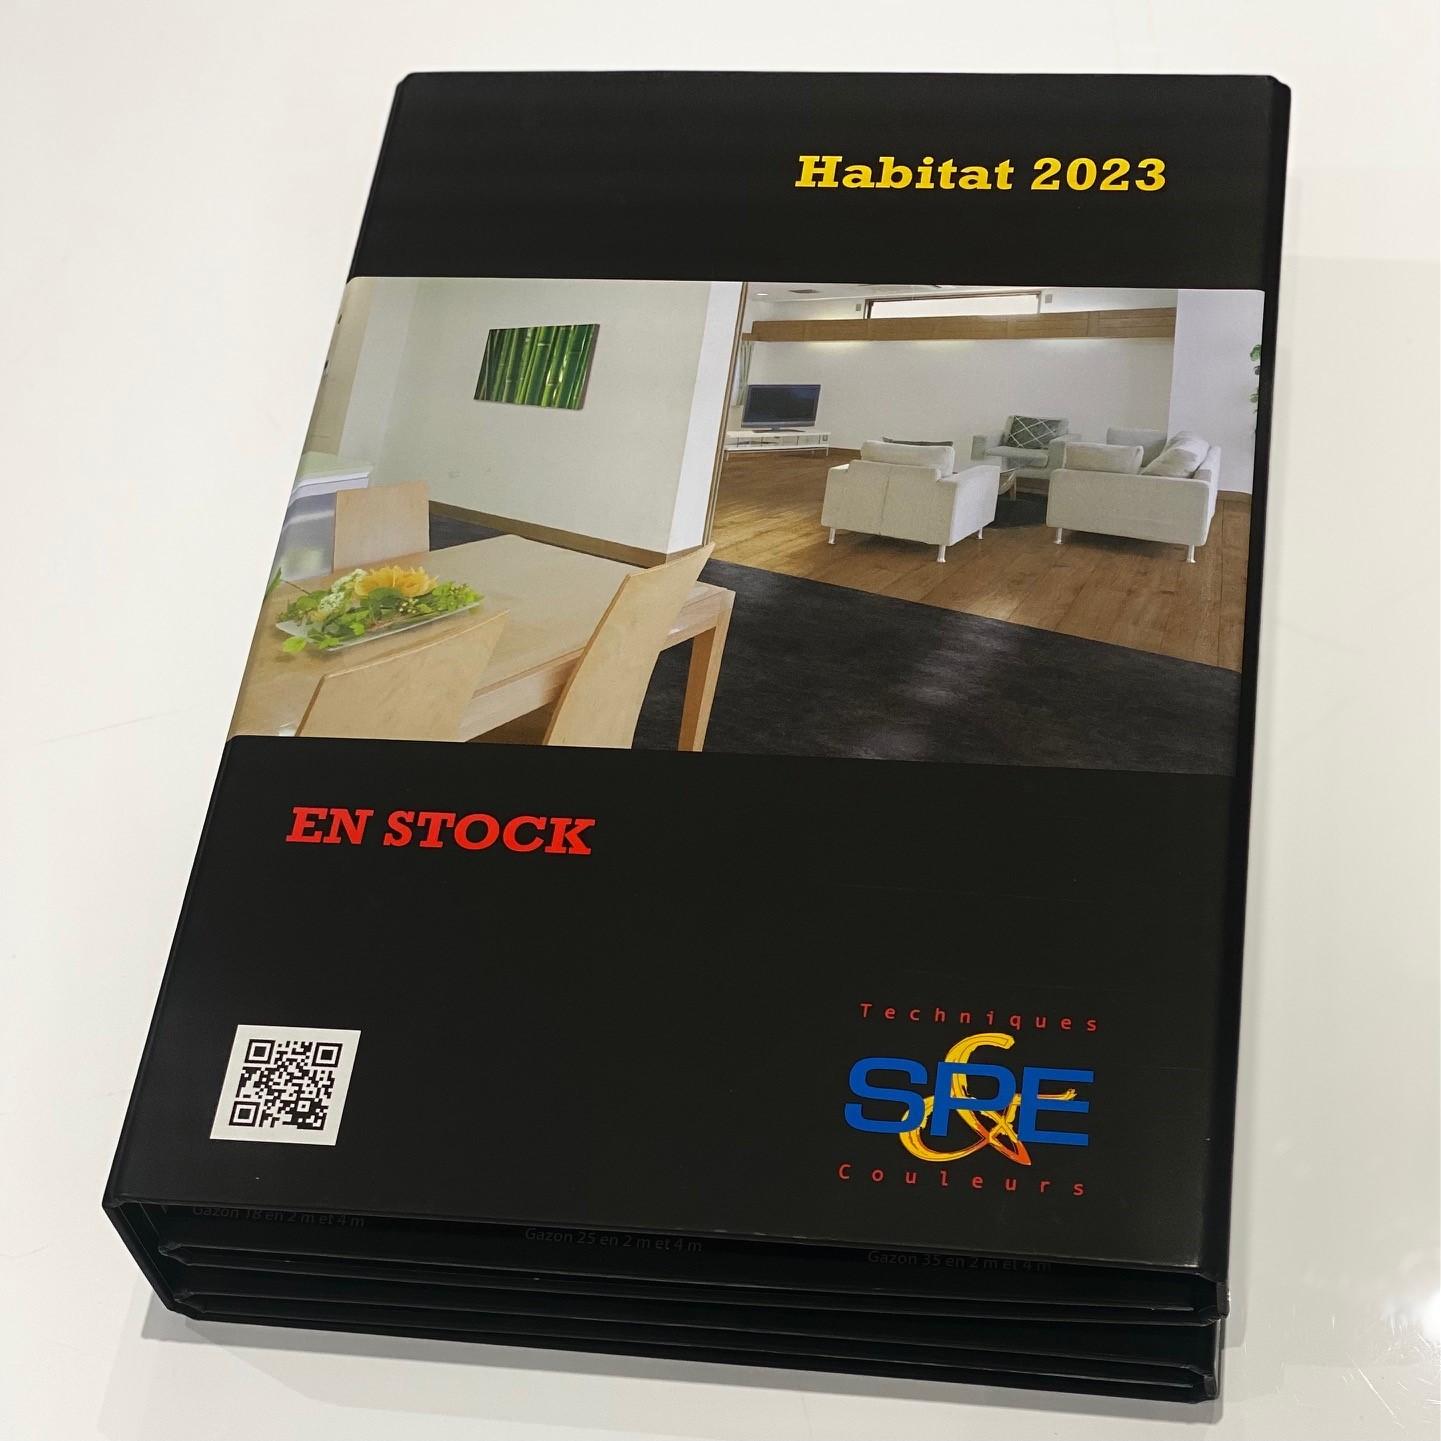 Habitat 2023